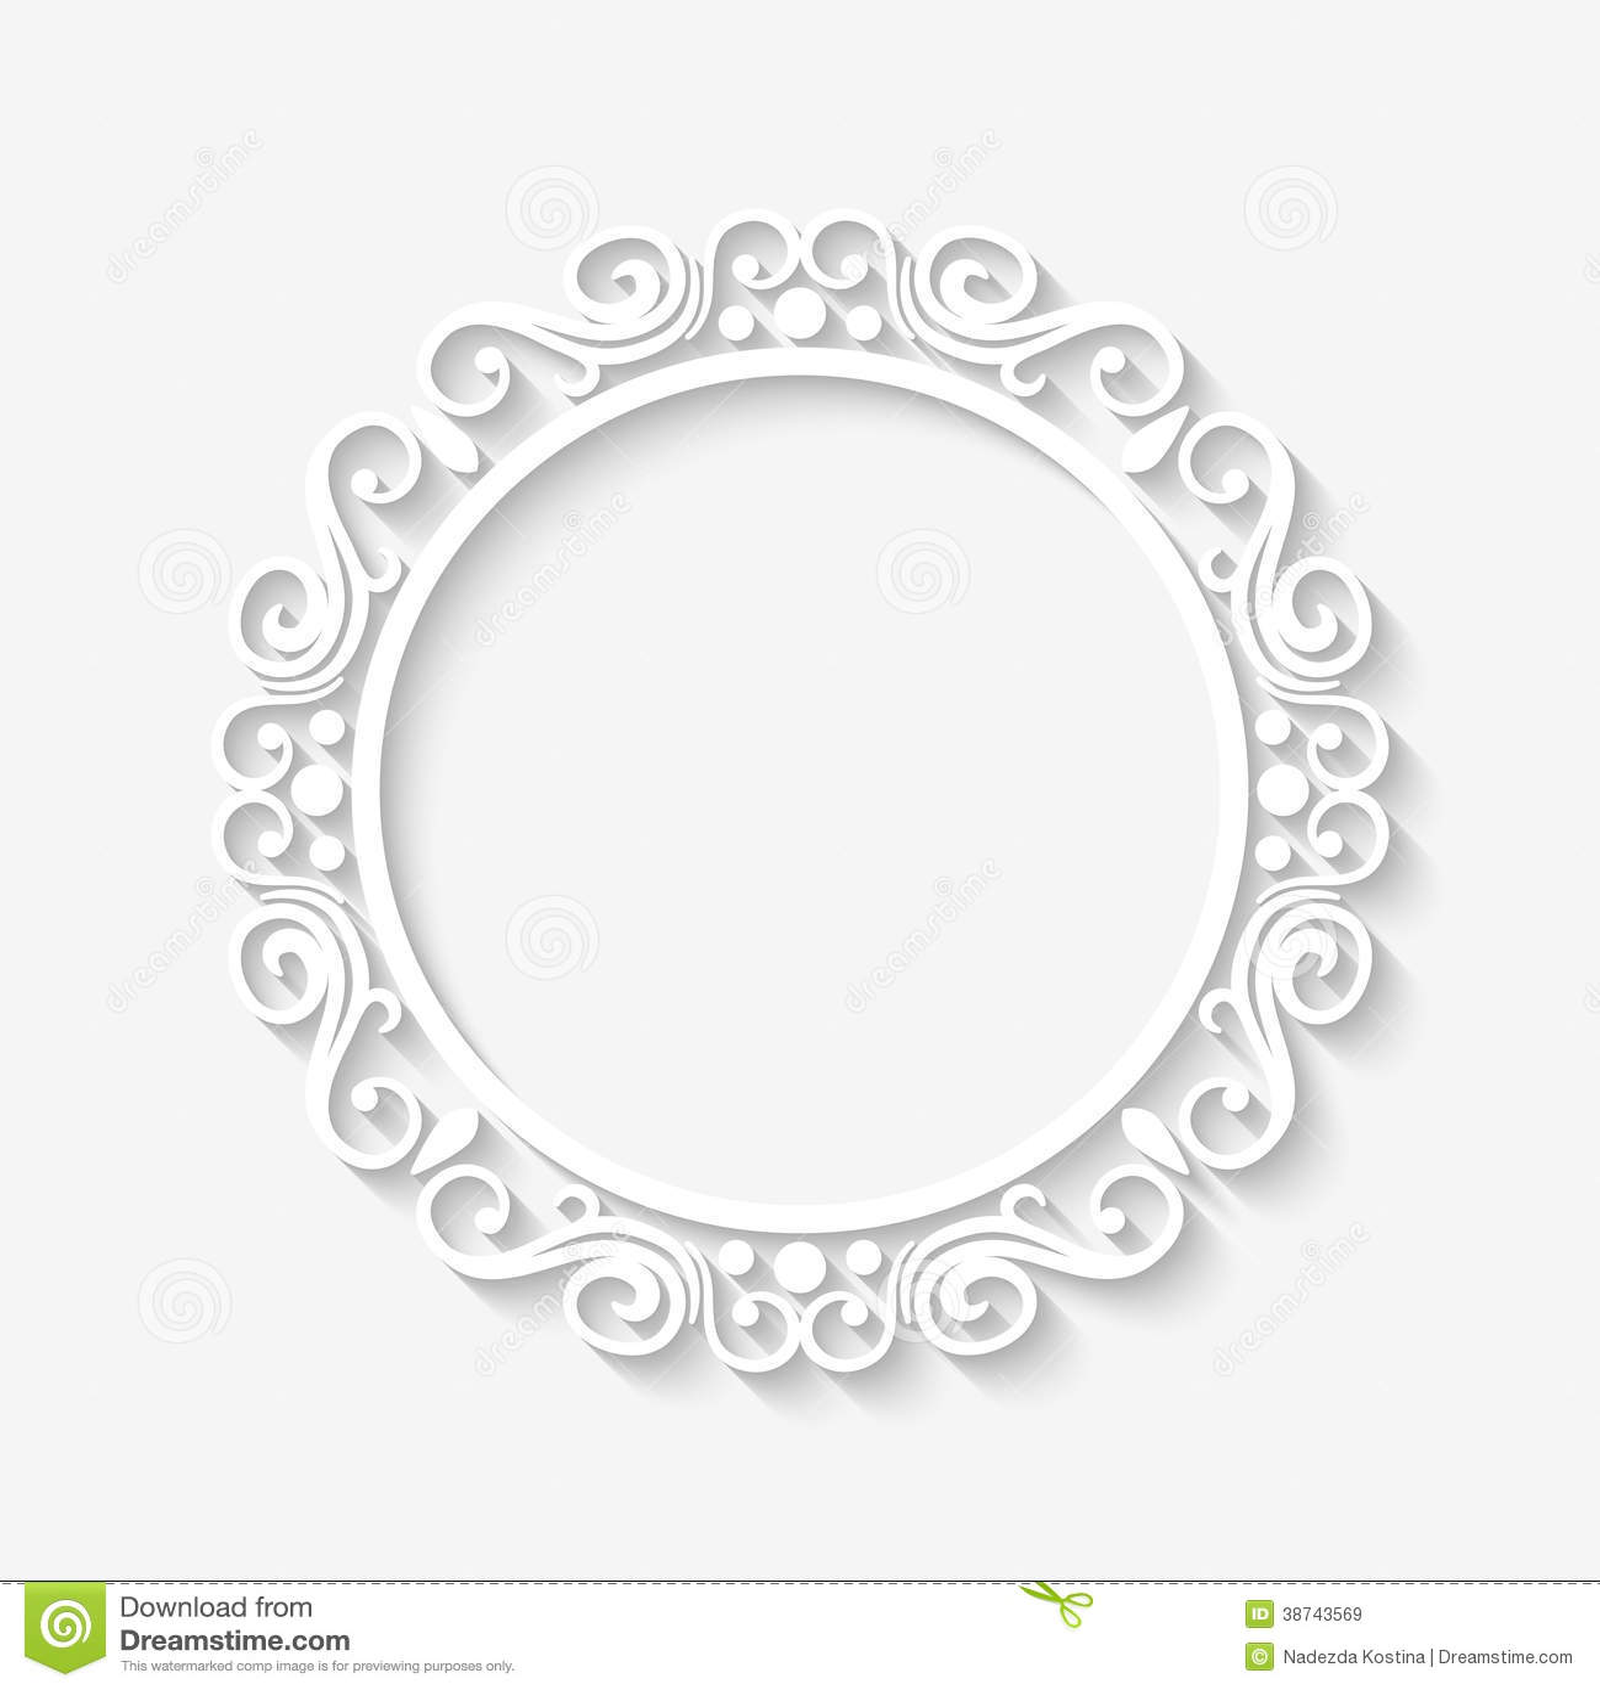 Vector Vintage Border White Frame Royalty Free Stock